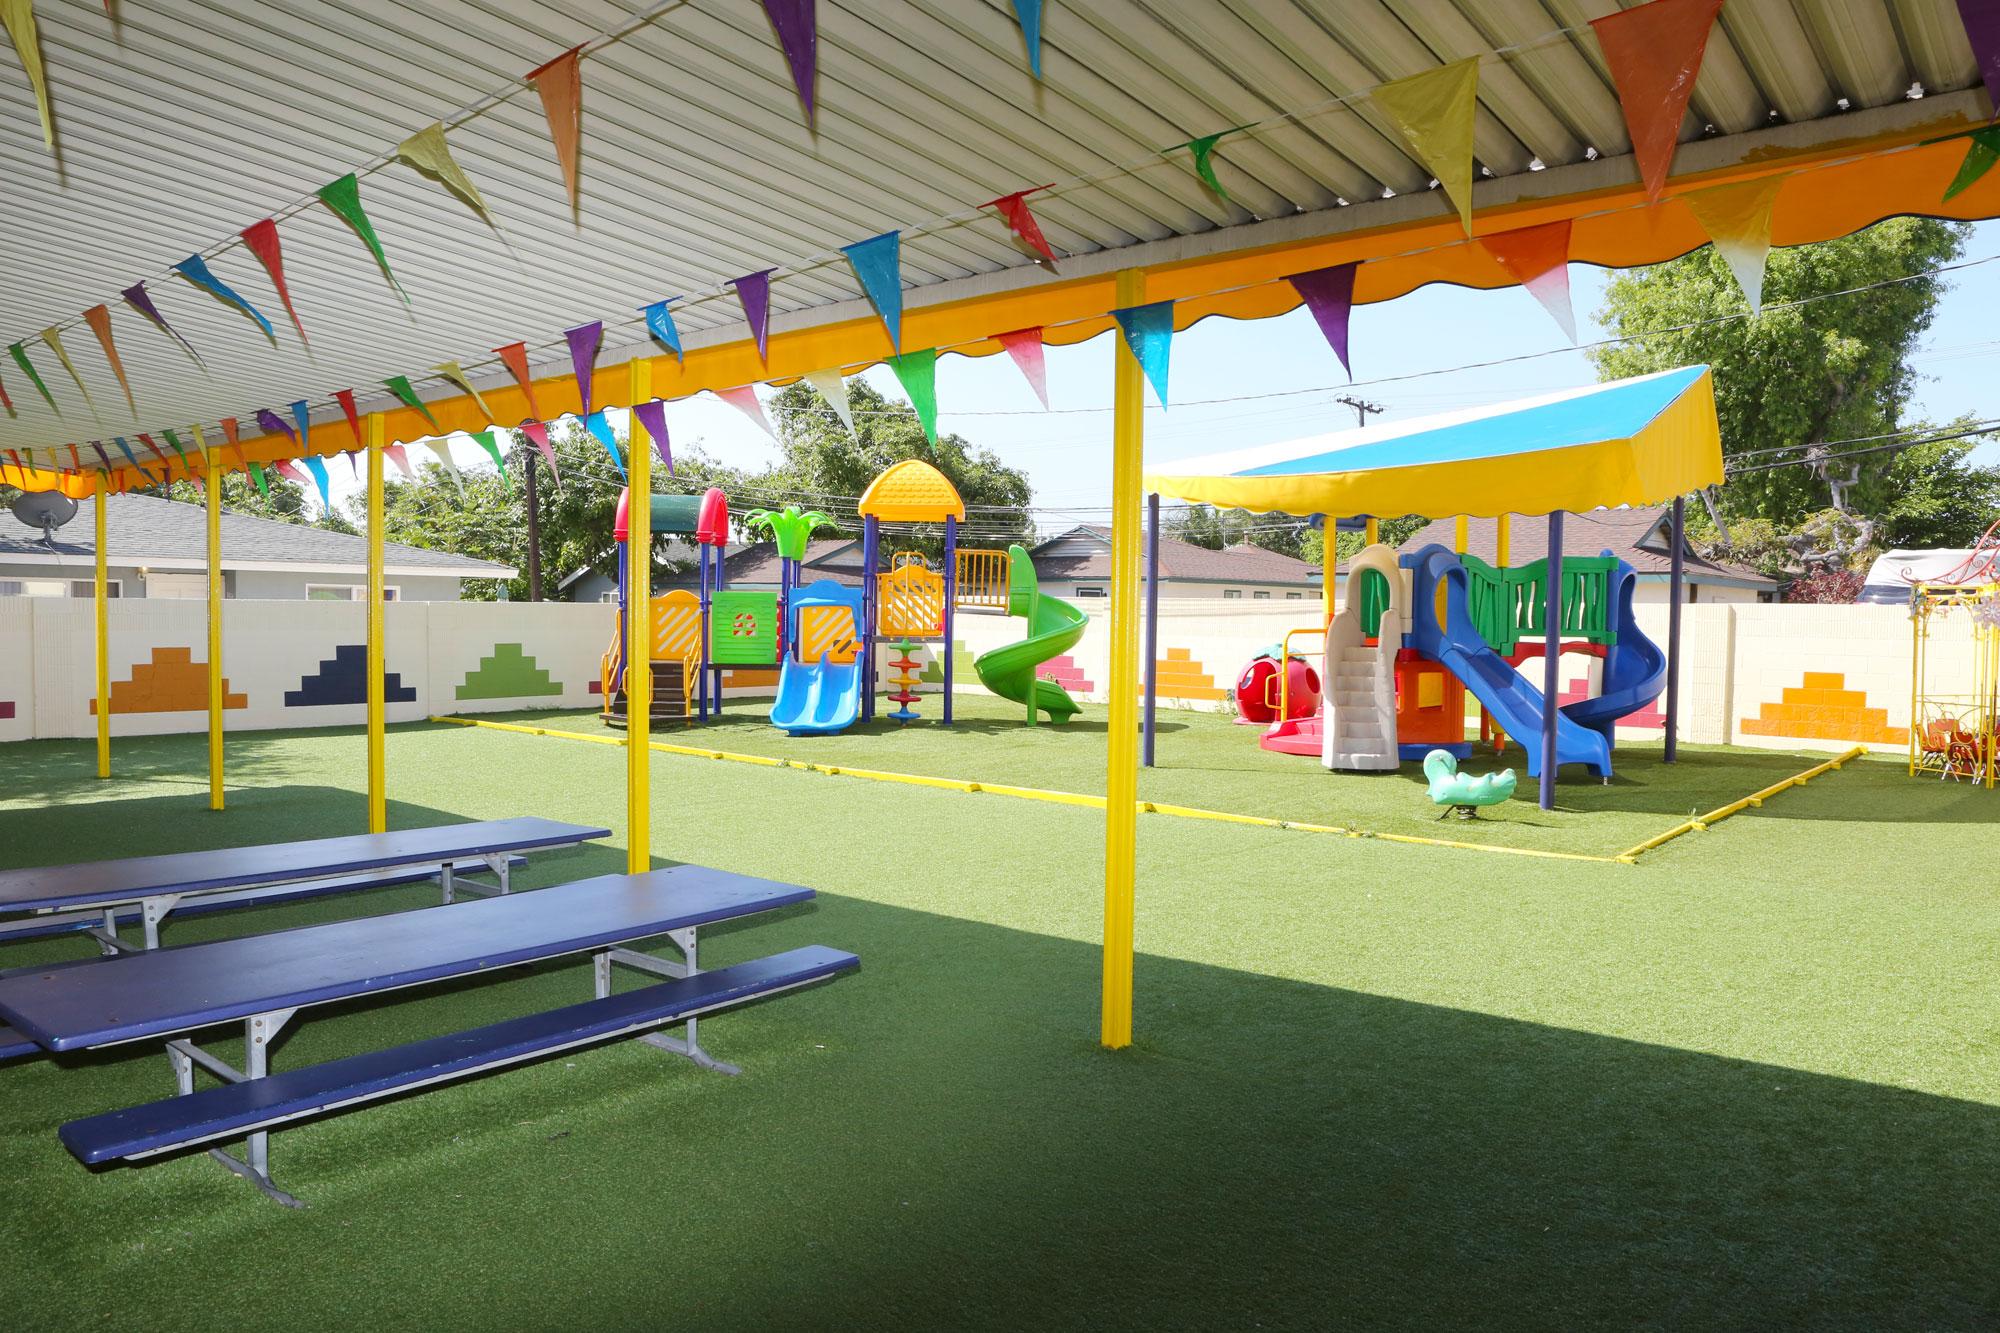 Newport Ave Preschool